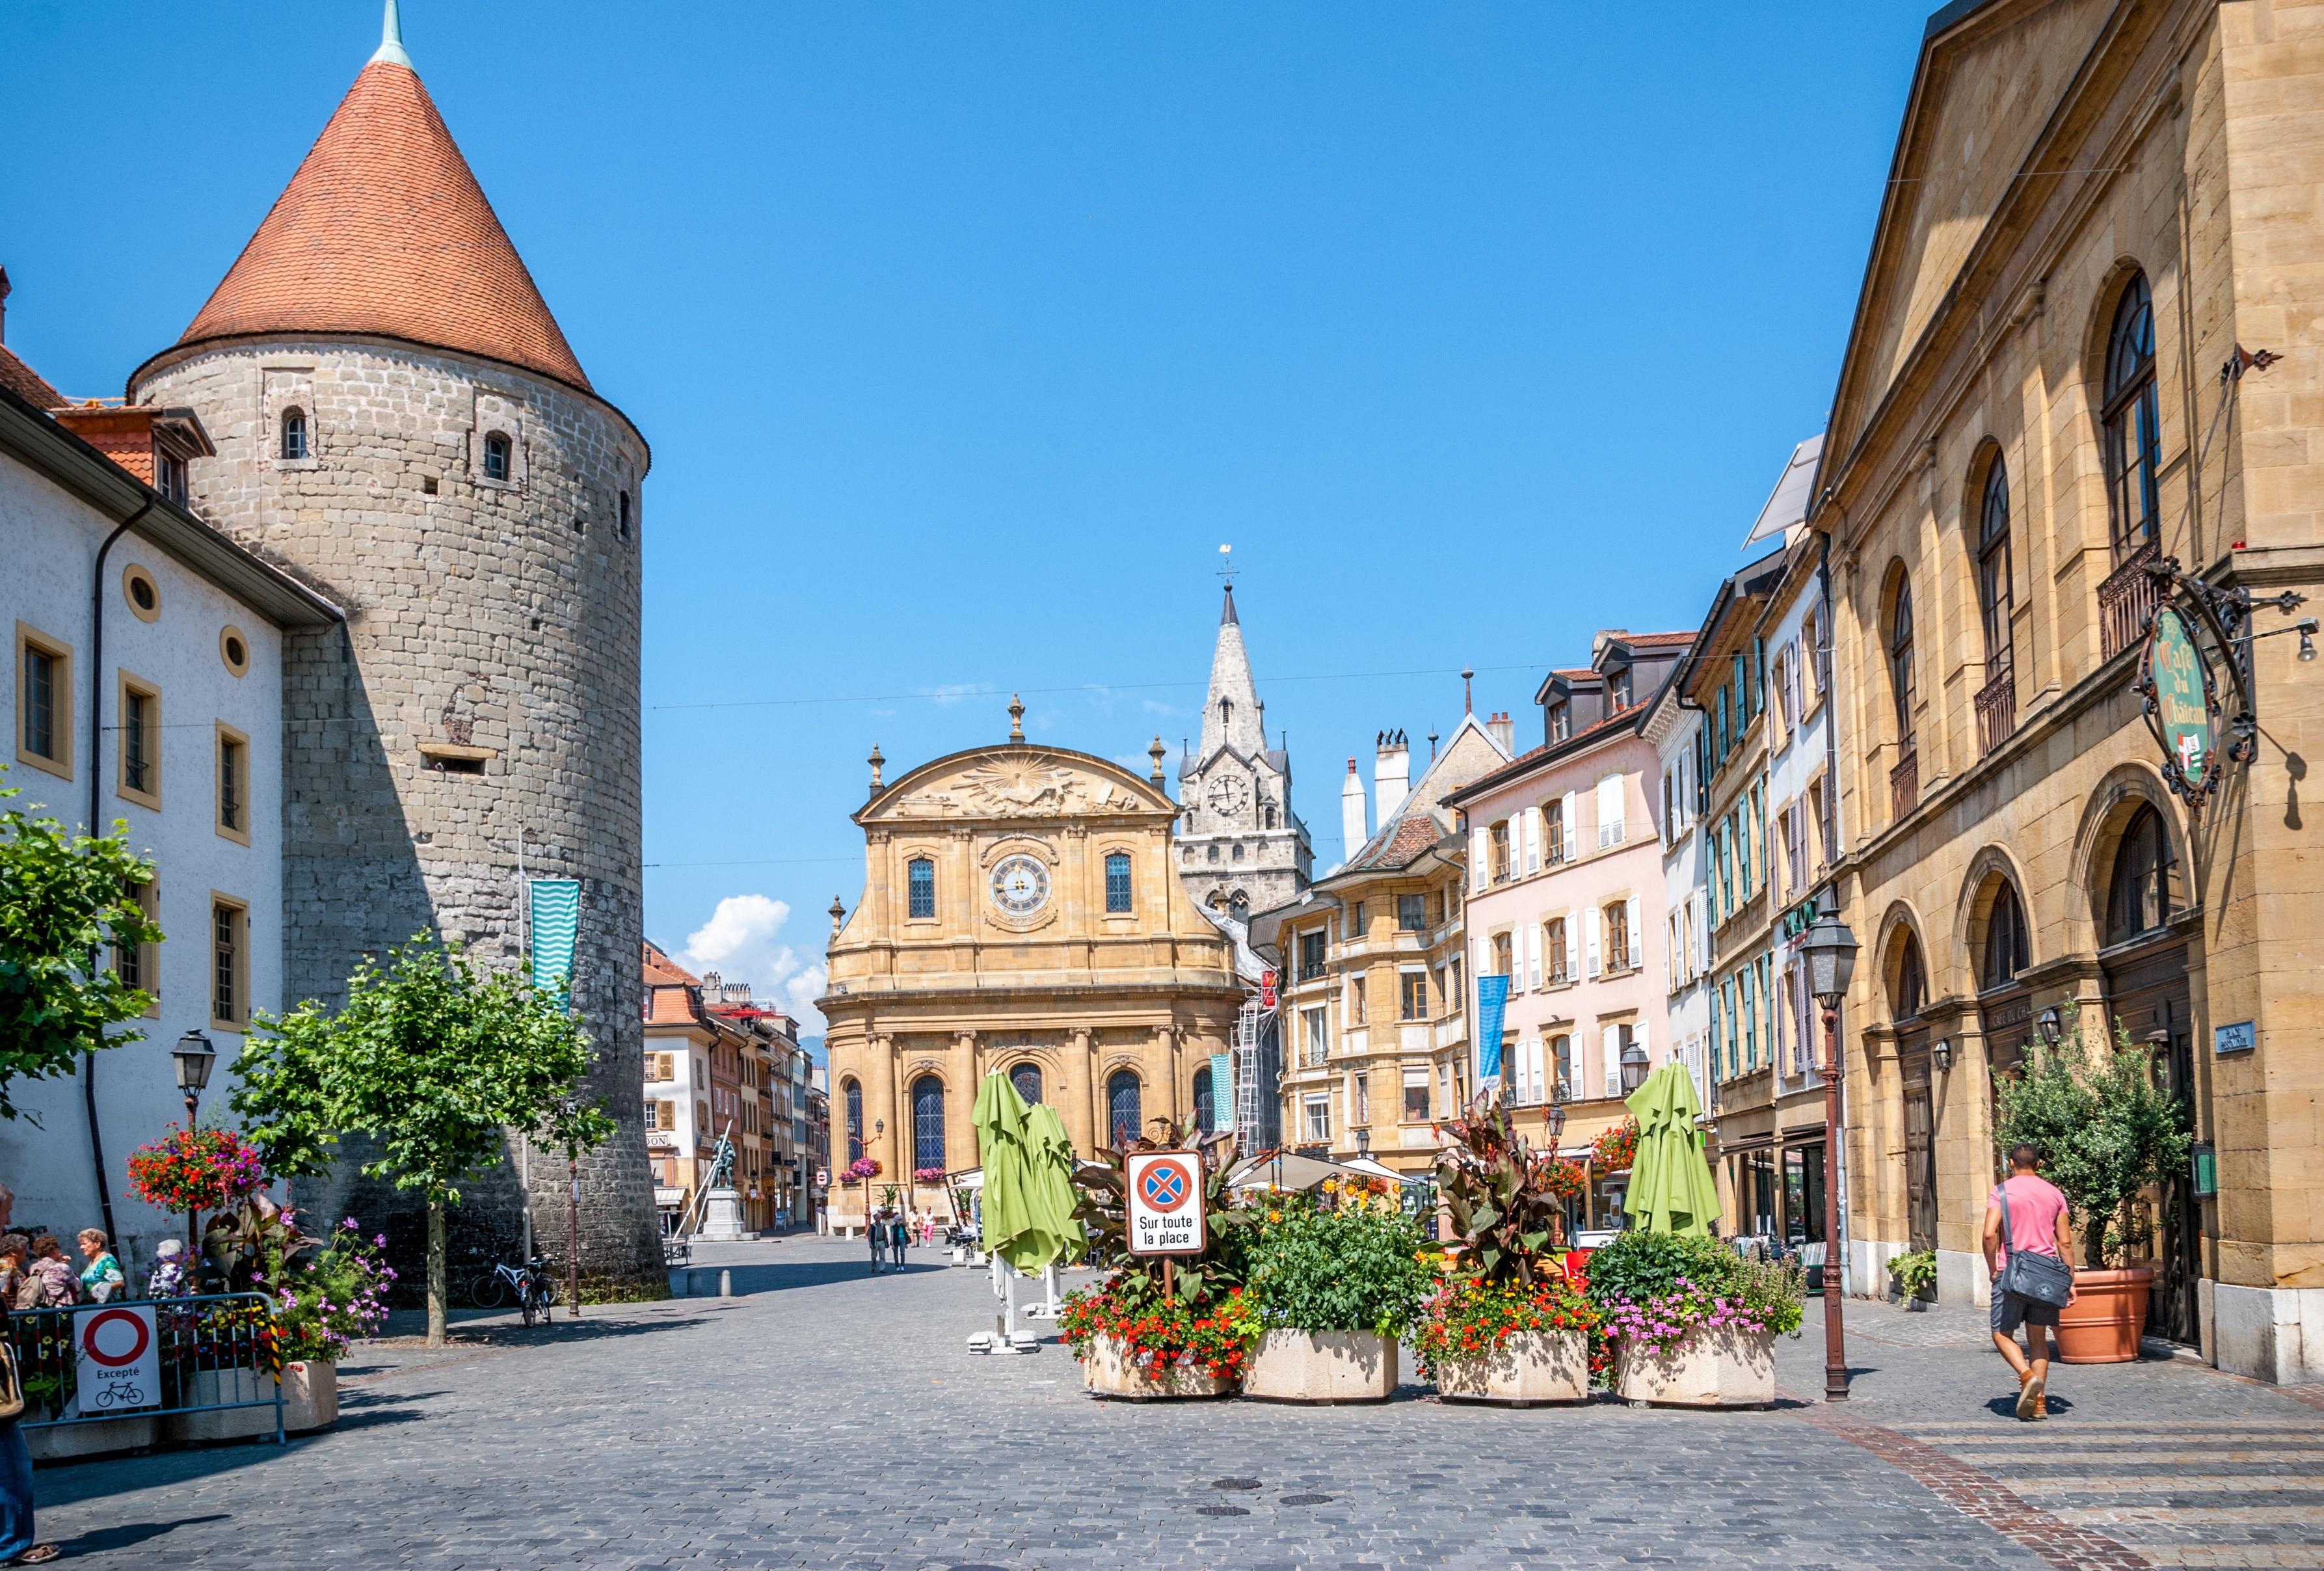 Yverdon-les-Bains, Canton of Vaud, Switzerland